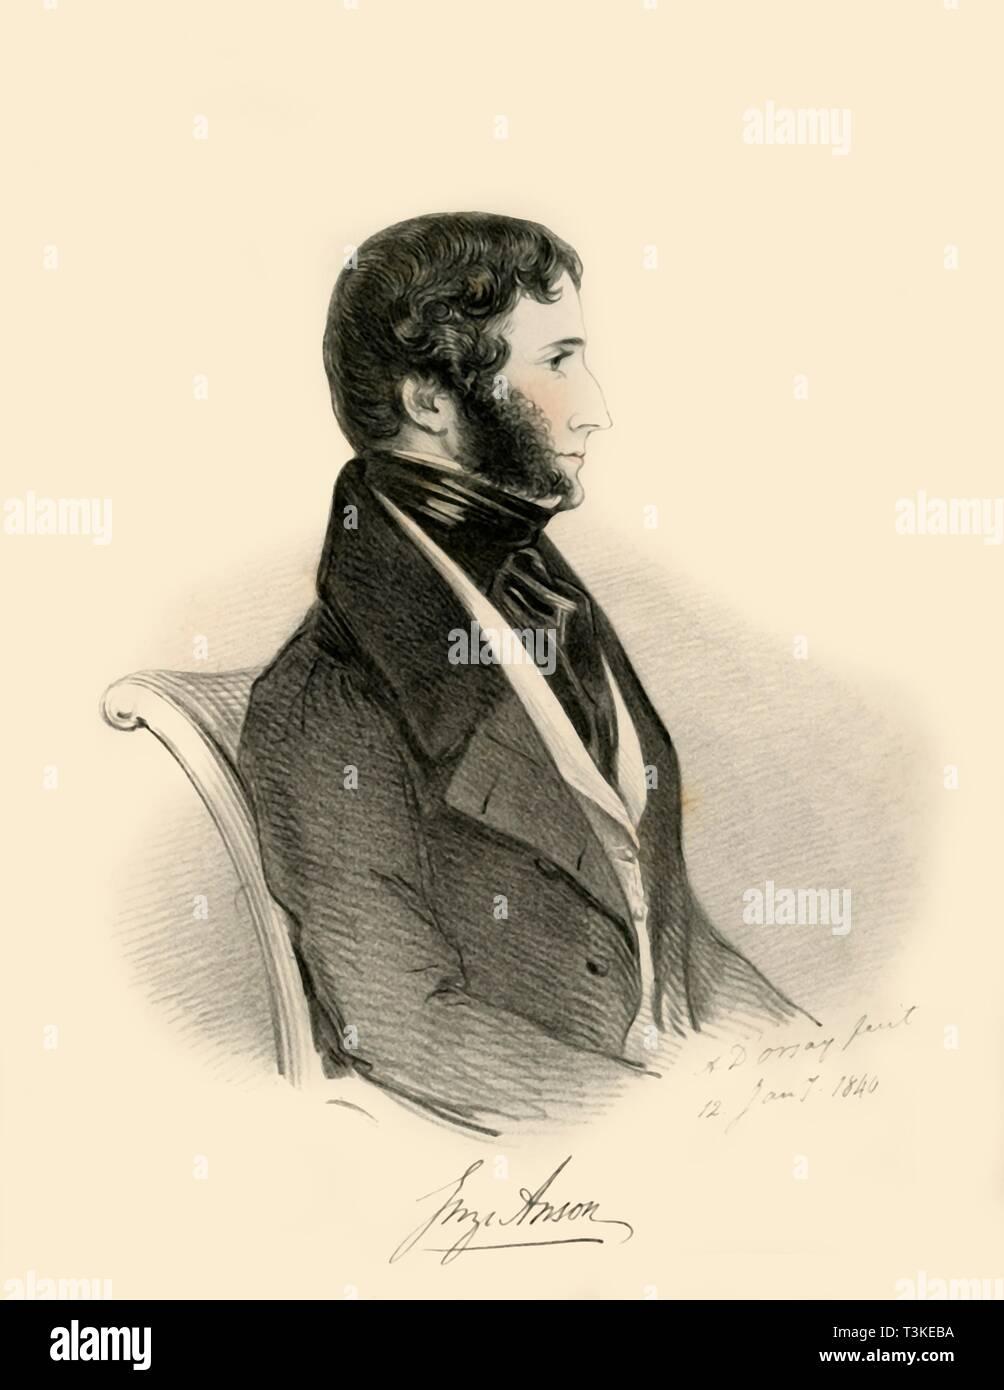 'George Anson', 1840. Creator: Richard James Lane. - Stock Image